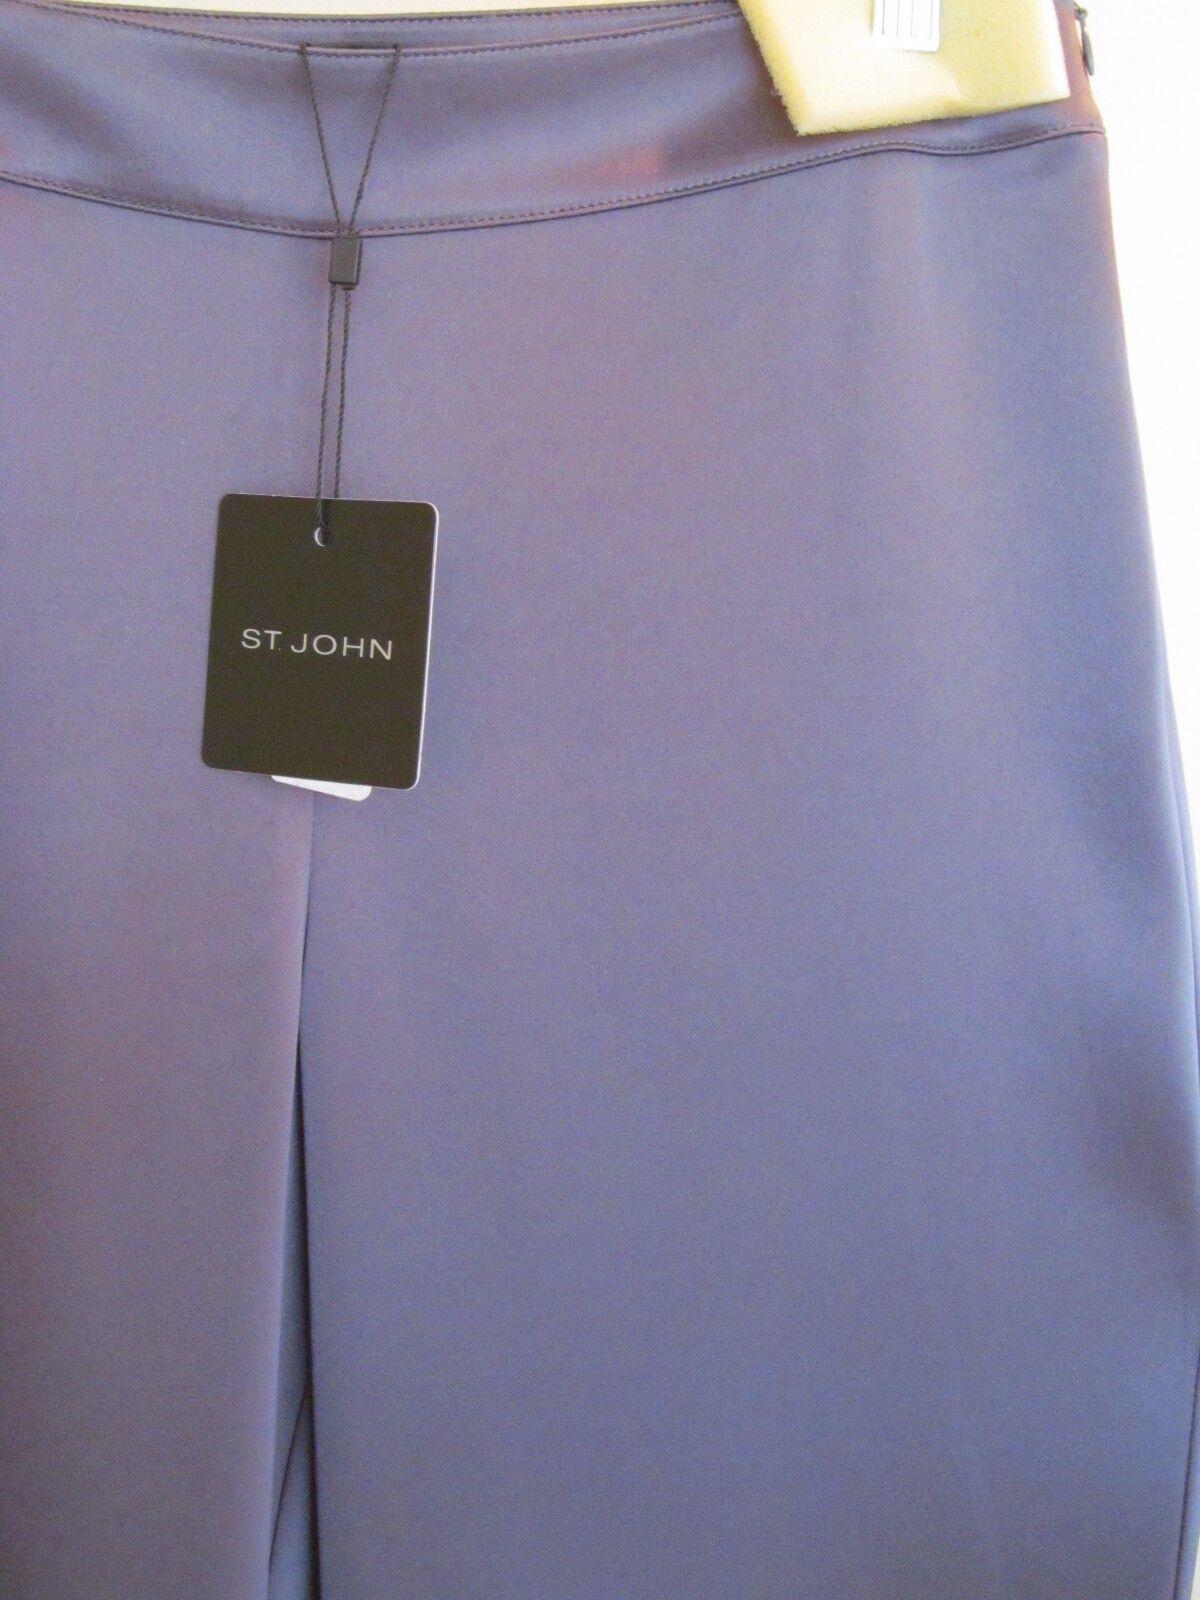 ST. JOHN dressy pants, grey color, NWT, retail  595, size 4